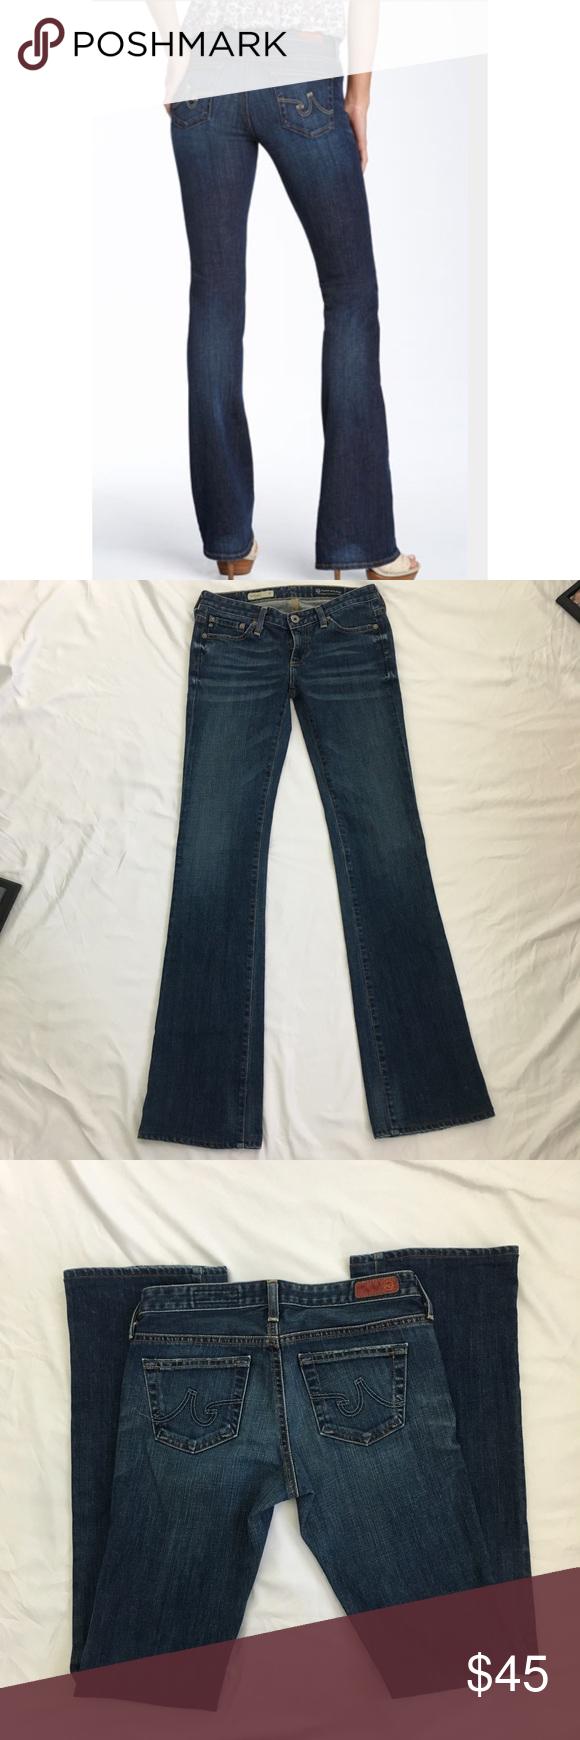 Bootcut jeans 98 cotton